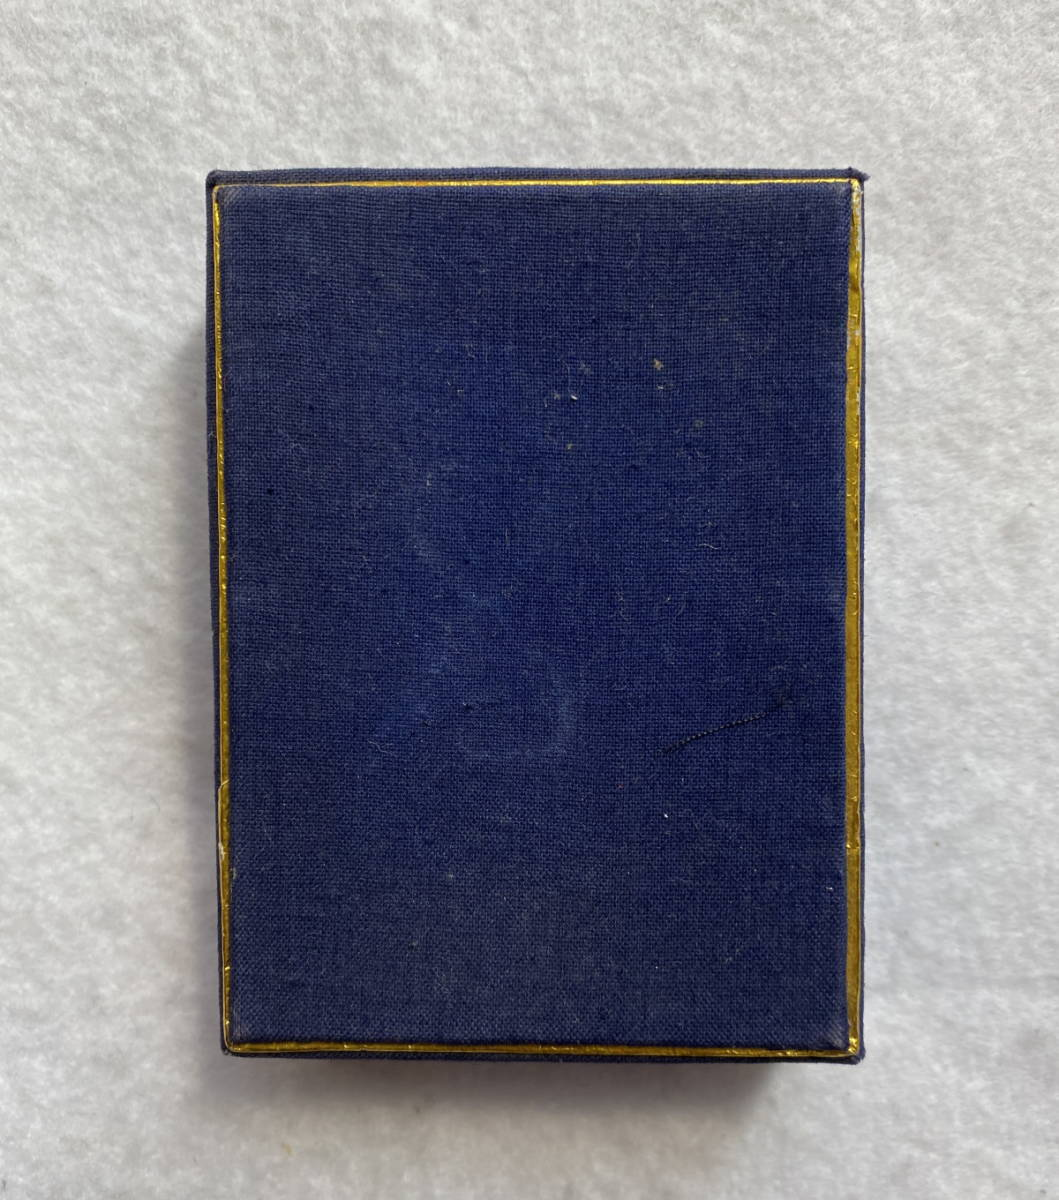 印材 1.6cm角 2個セット 印章 篆刻 中国 書道_画像6